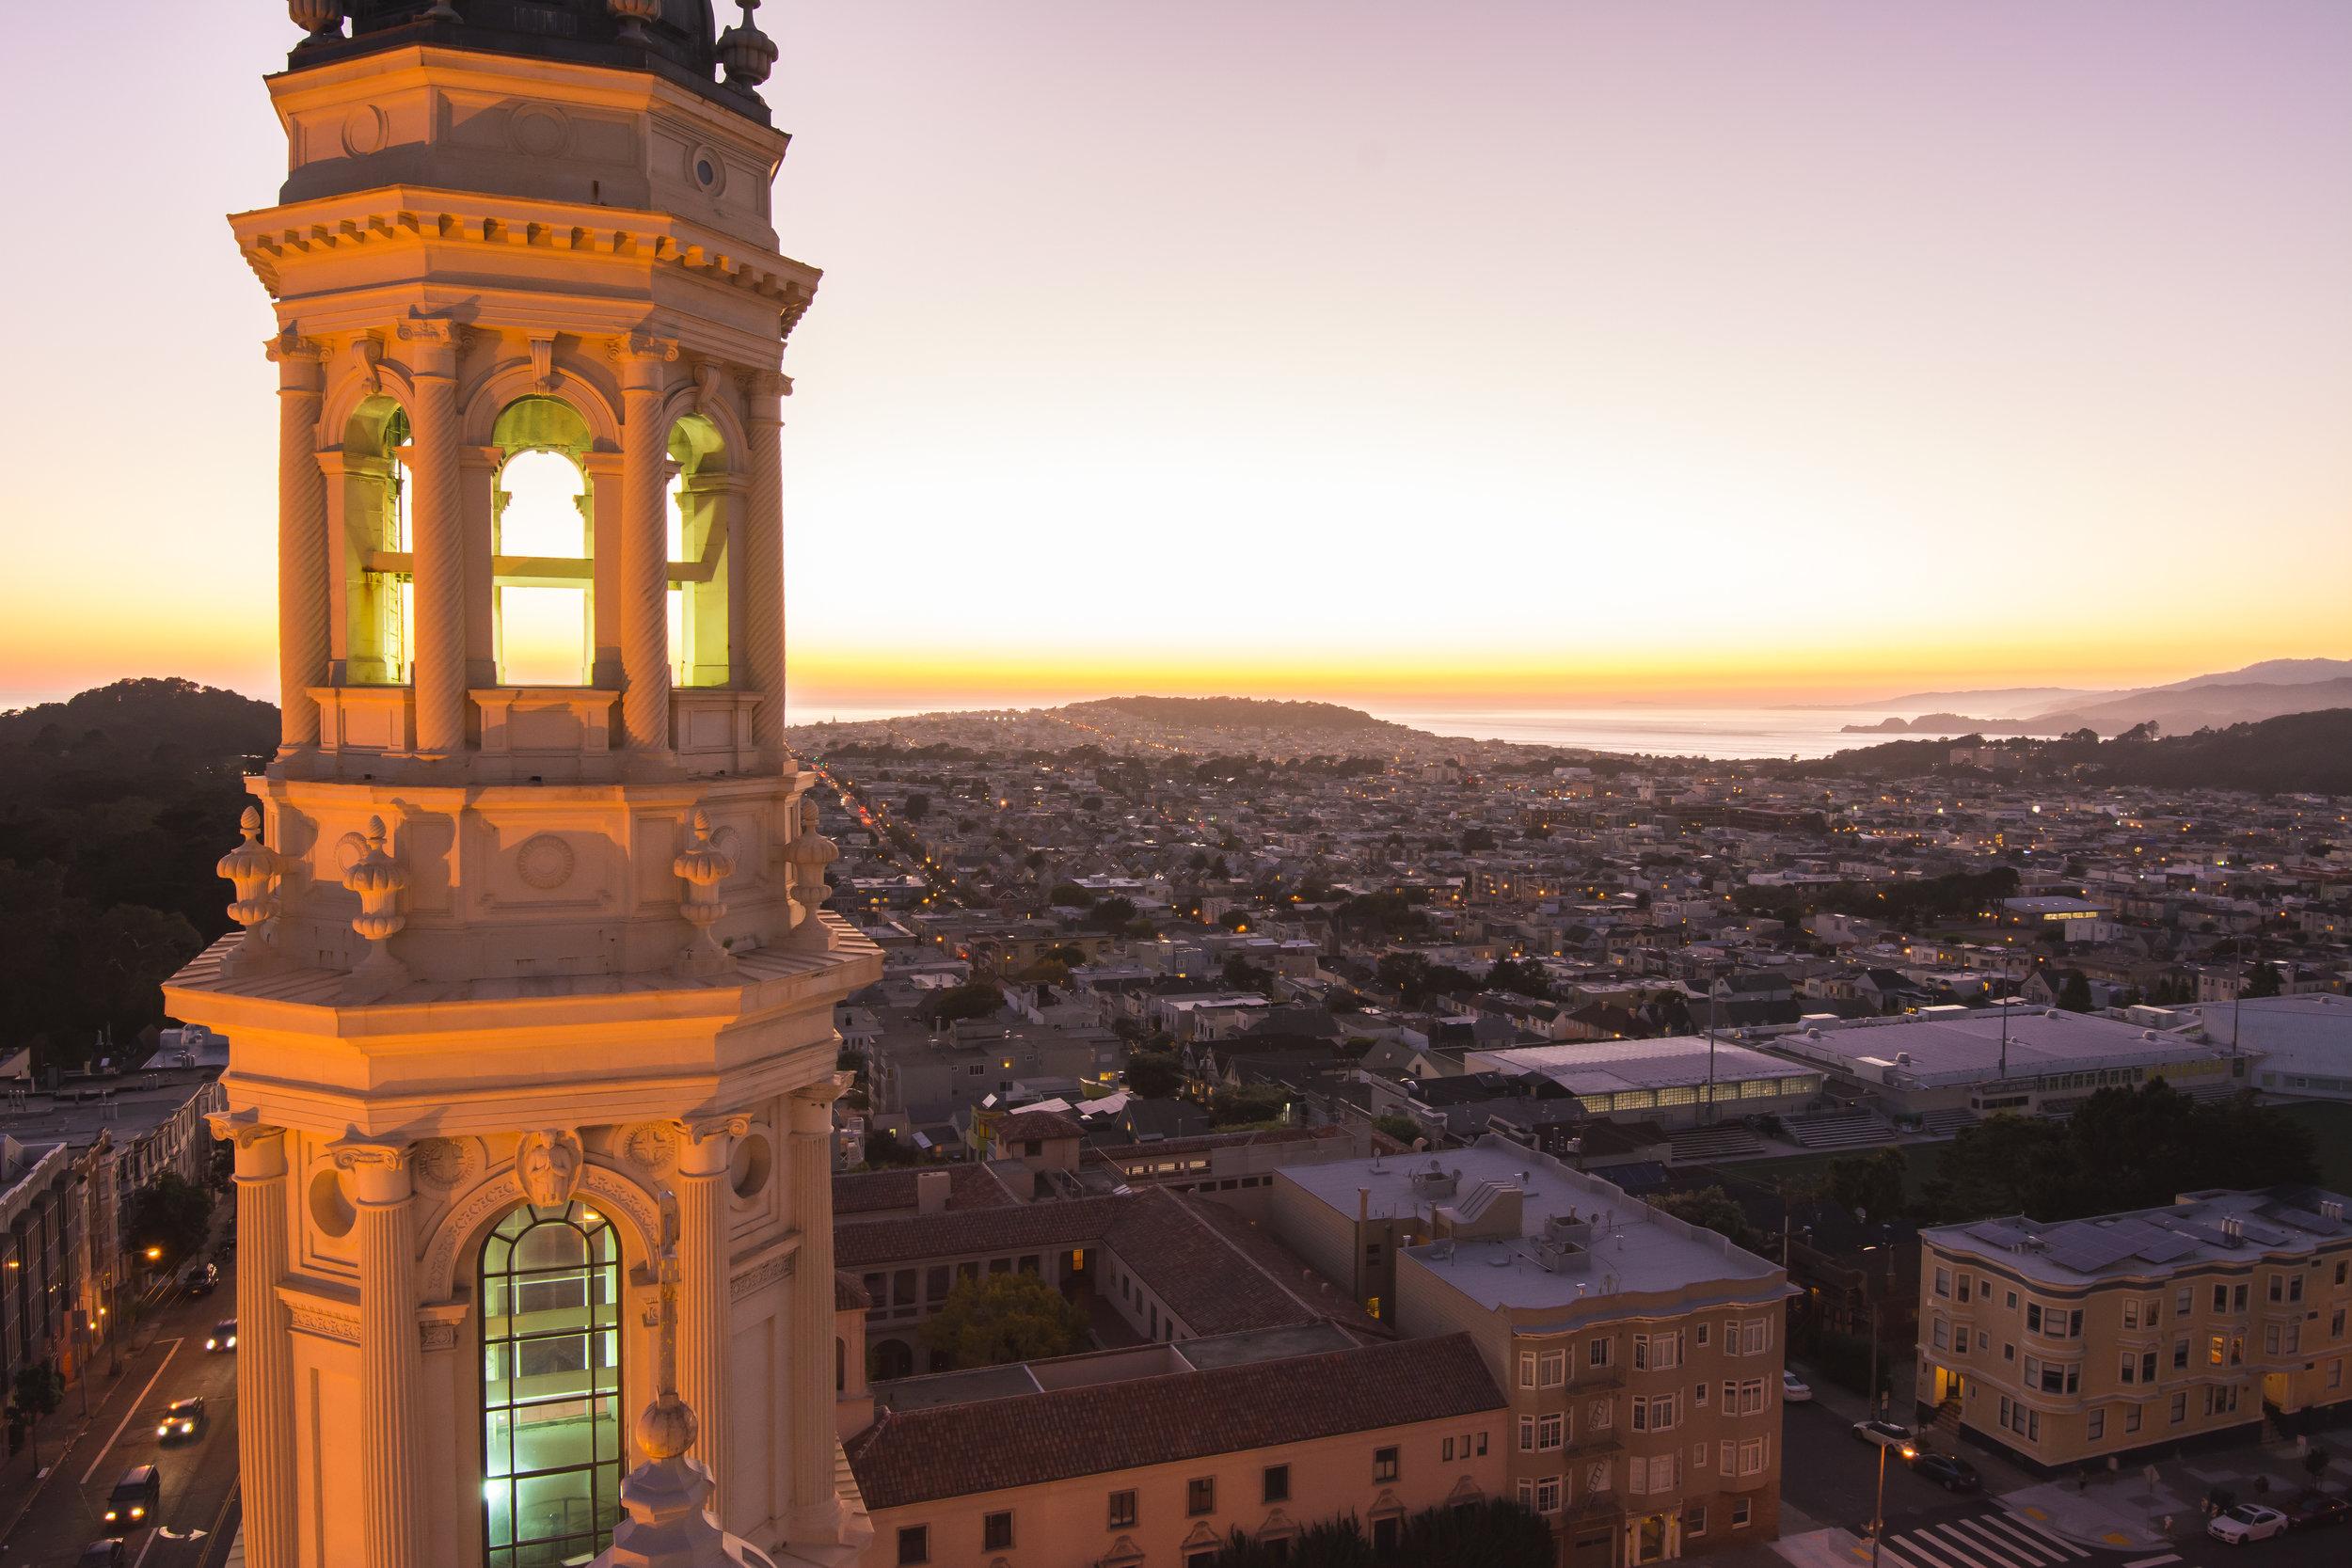 St. Ignatius Church - Bell Tower (photo courtesy of University of San Francisco)